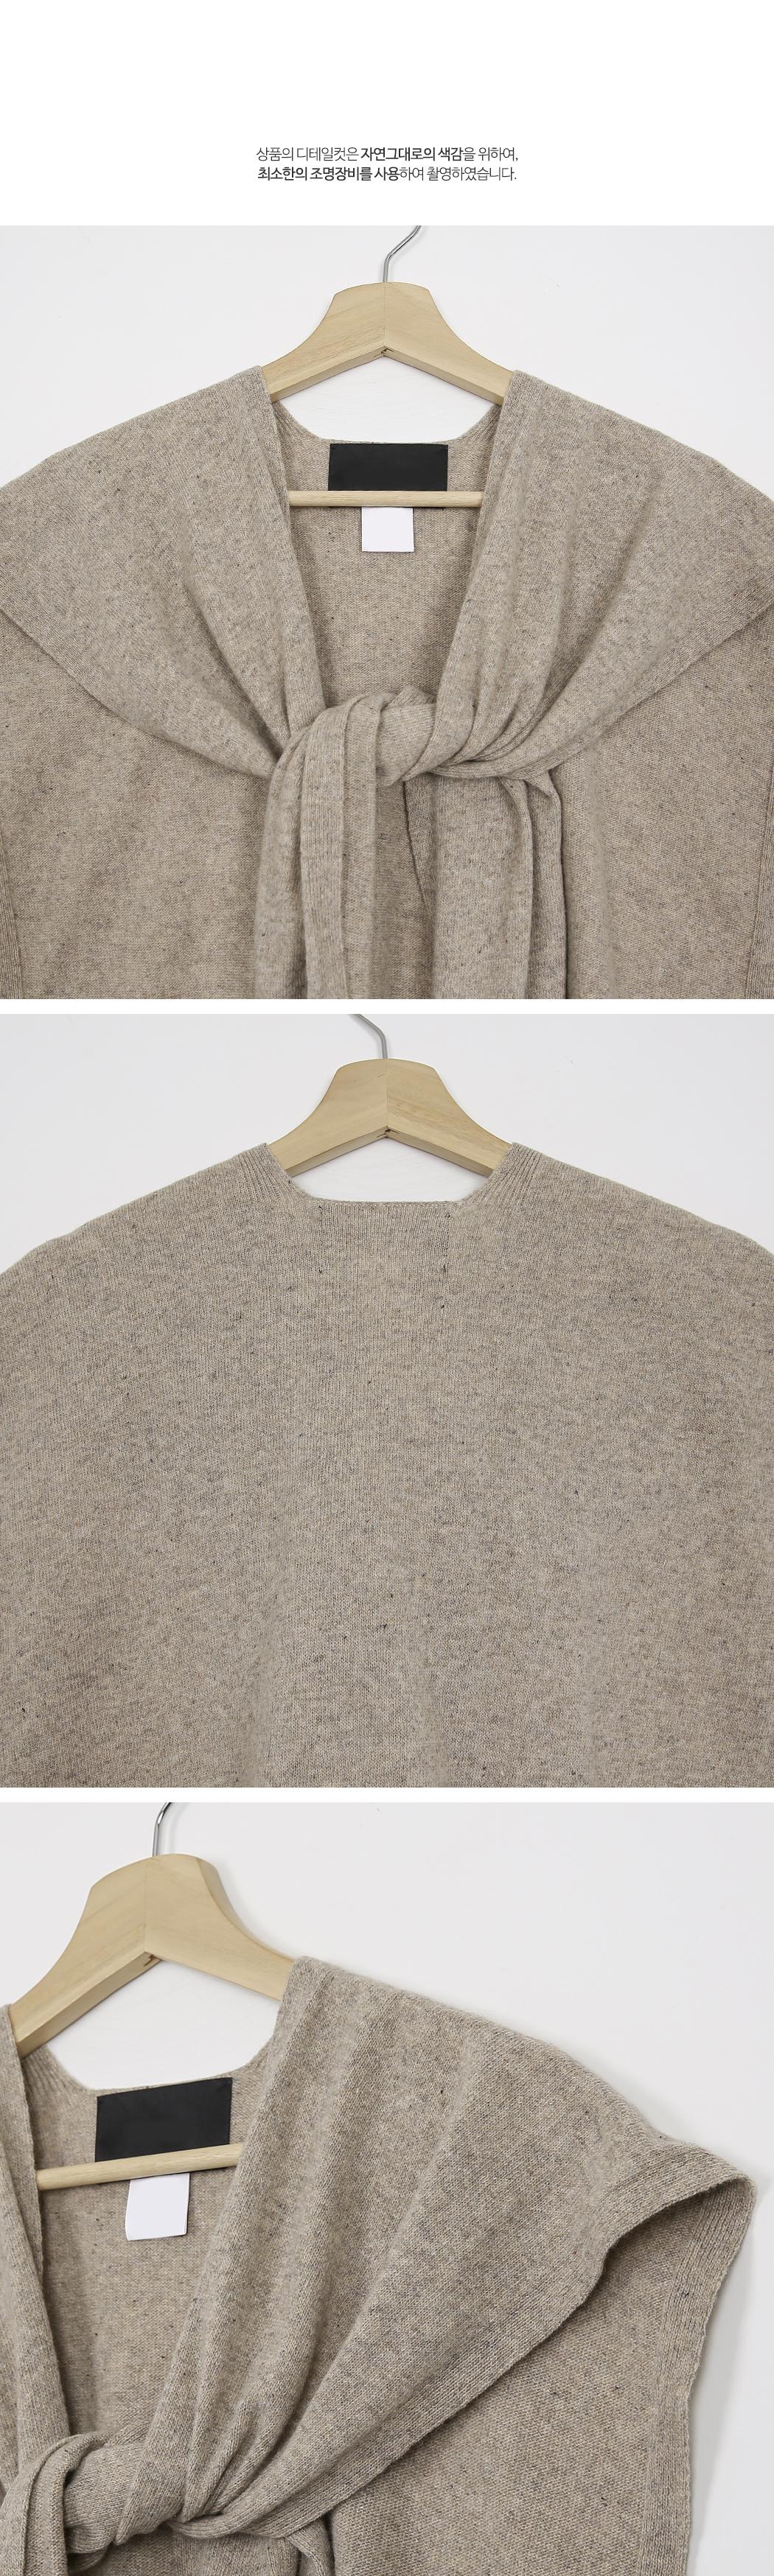 Wool knit shawl